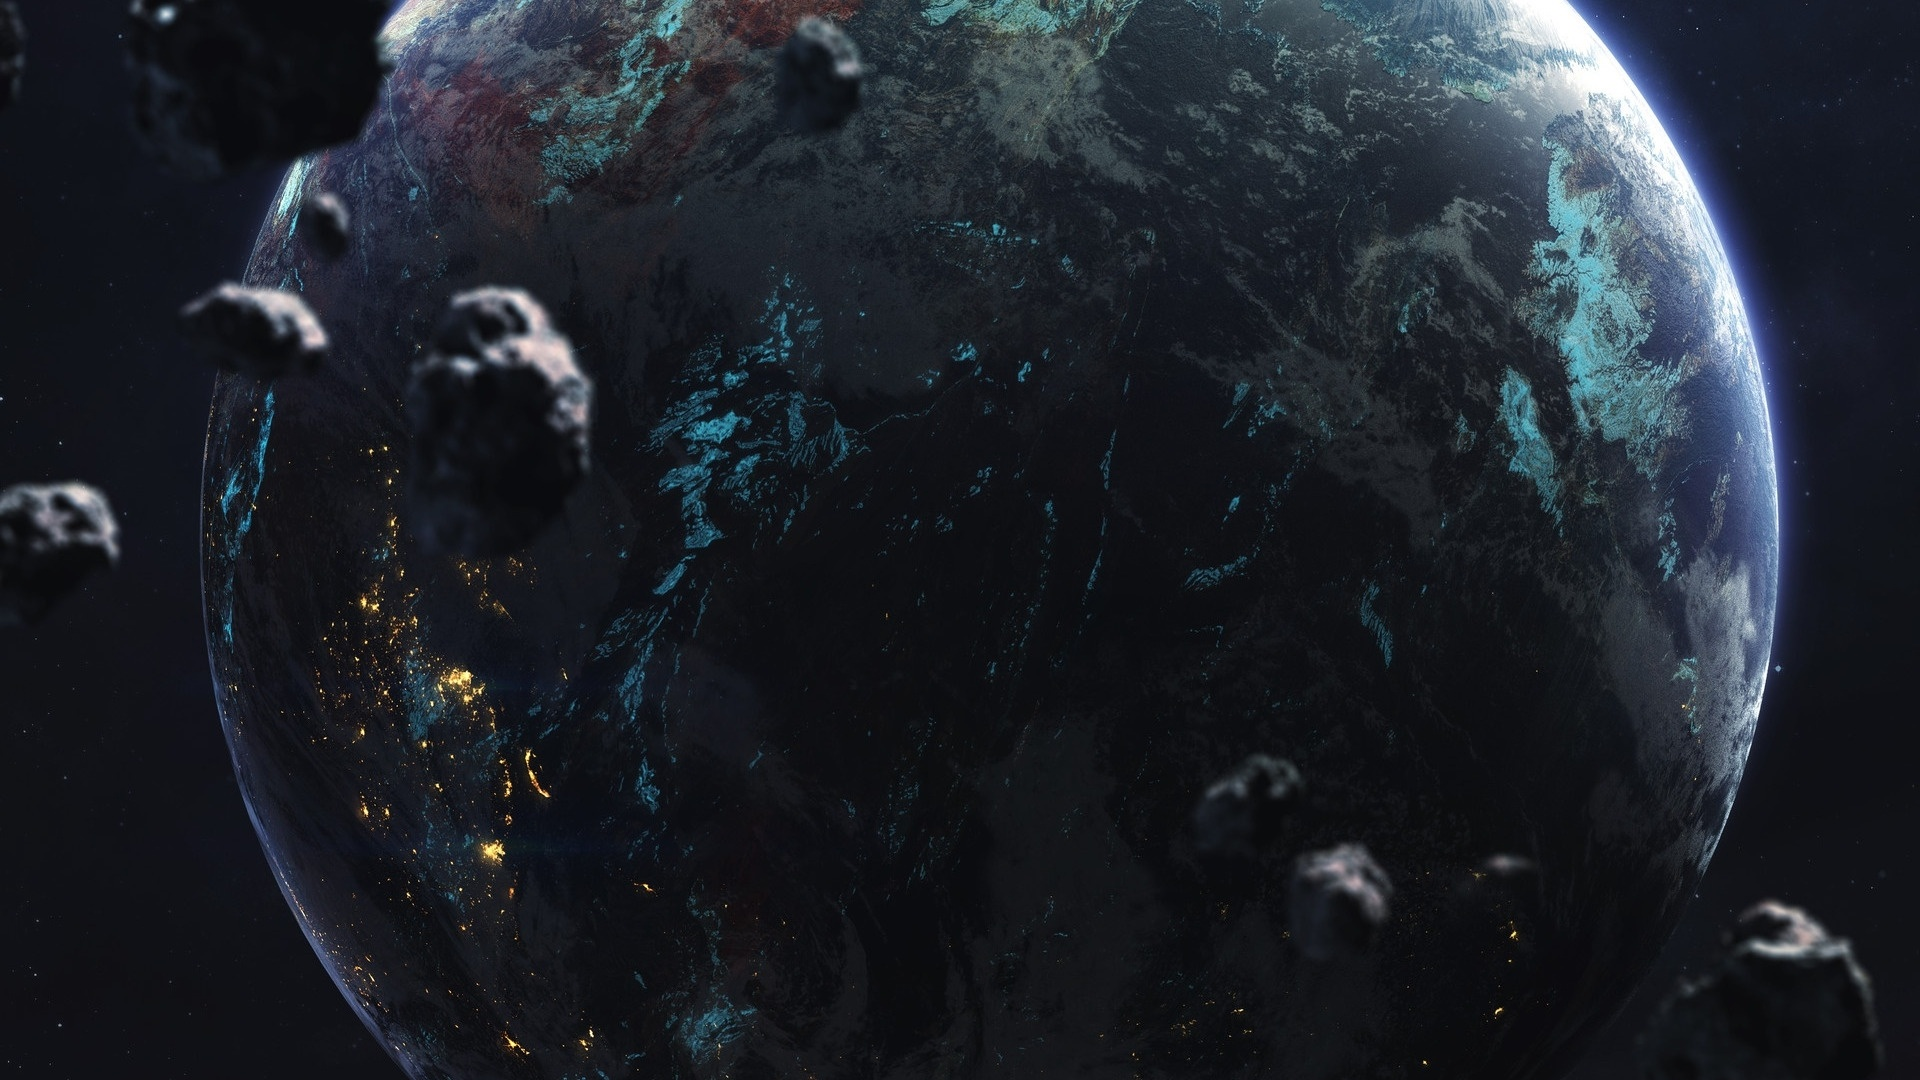 Alien Planet Art Background